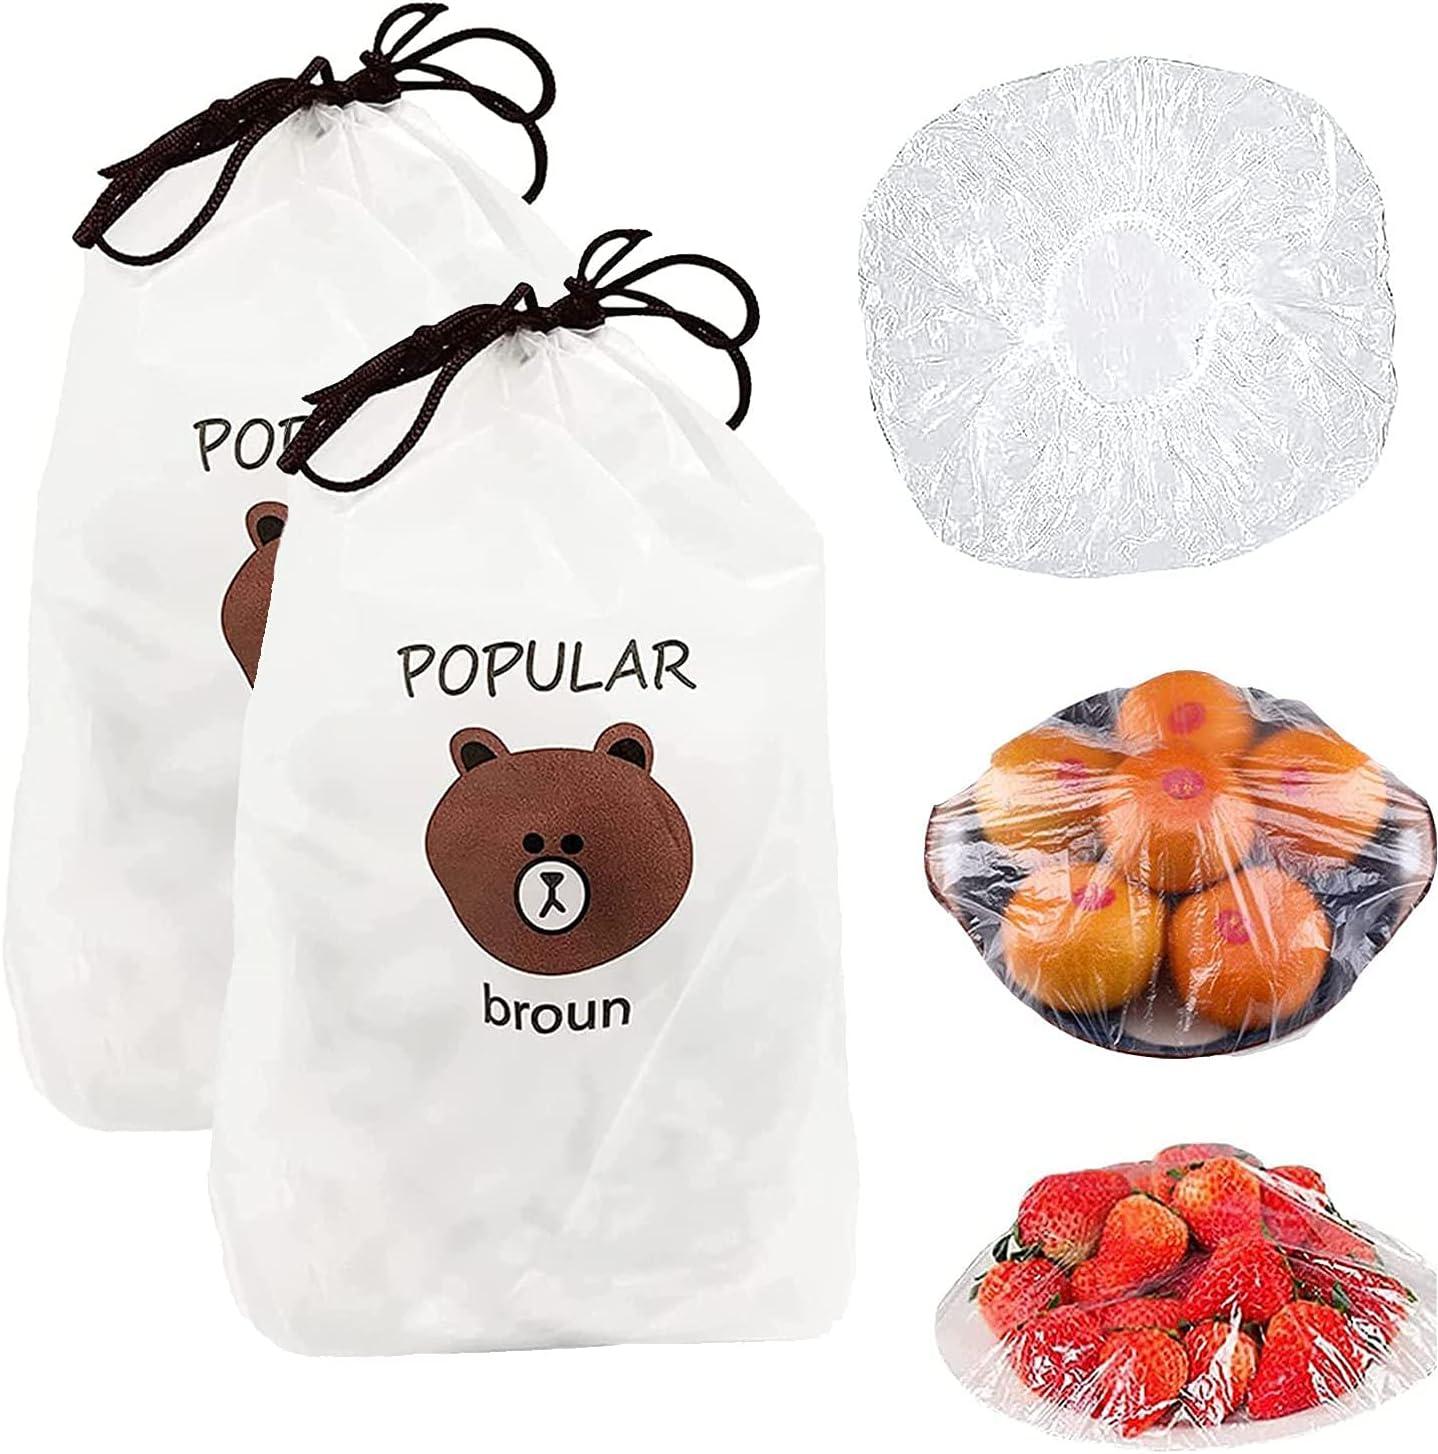 200 PCS Fresh Keeping Bags, Reusable Elastic Food Storage Covers, Plastic Sealing Elastic Stretch Bowl Lids, Universal Kitchen Wrap Seal Caps